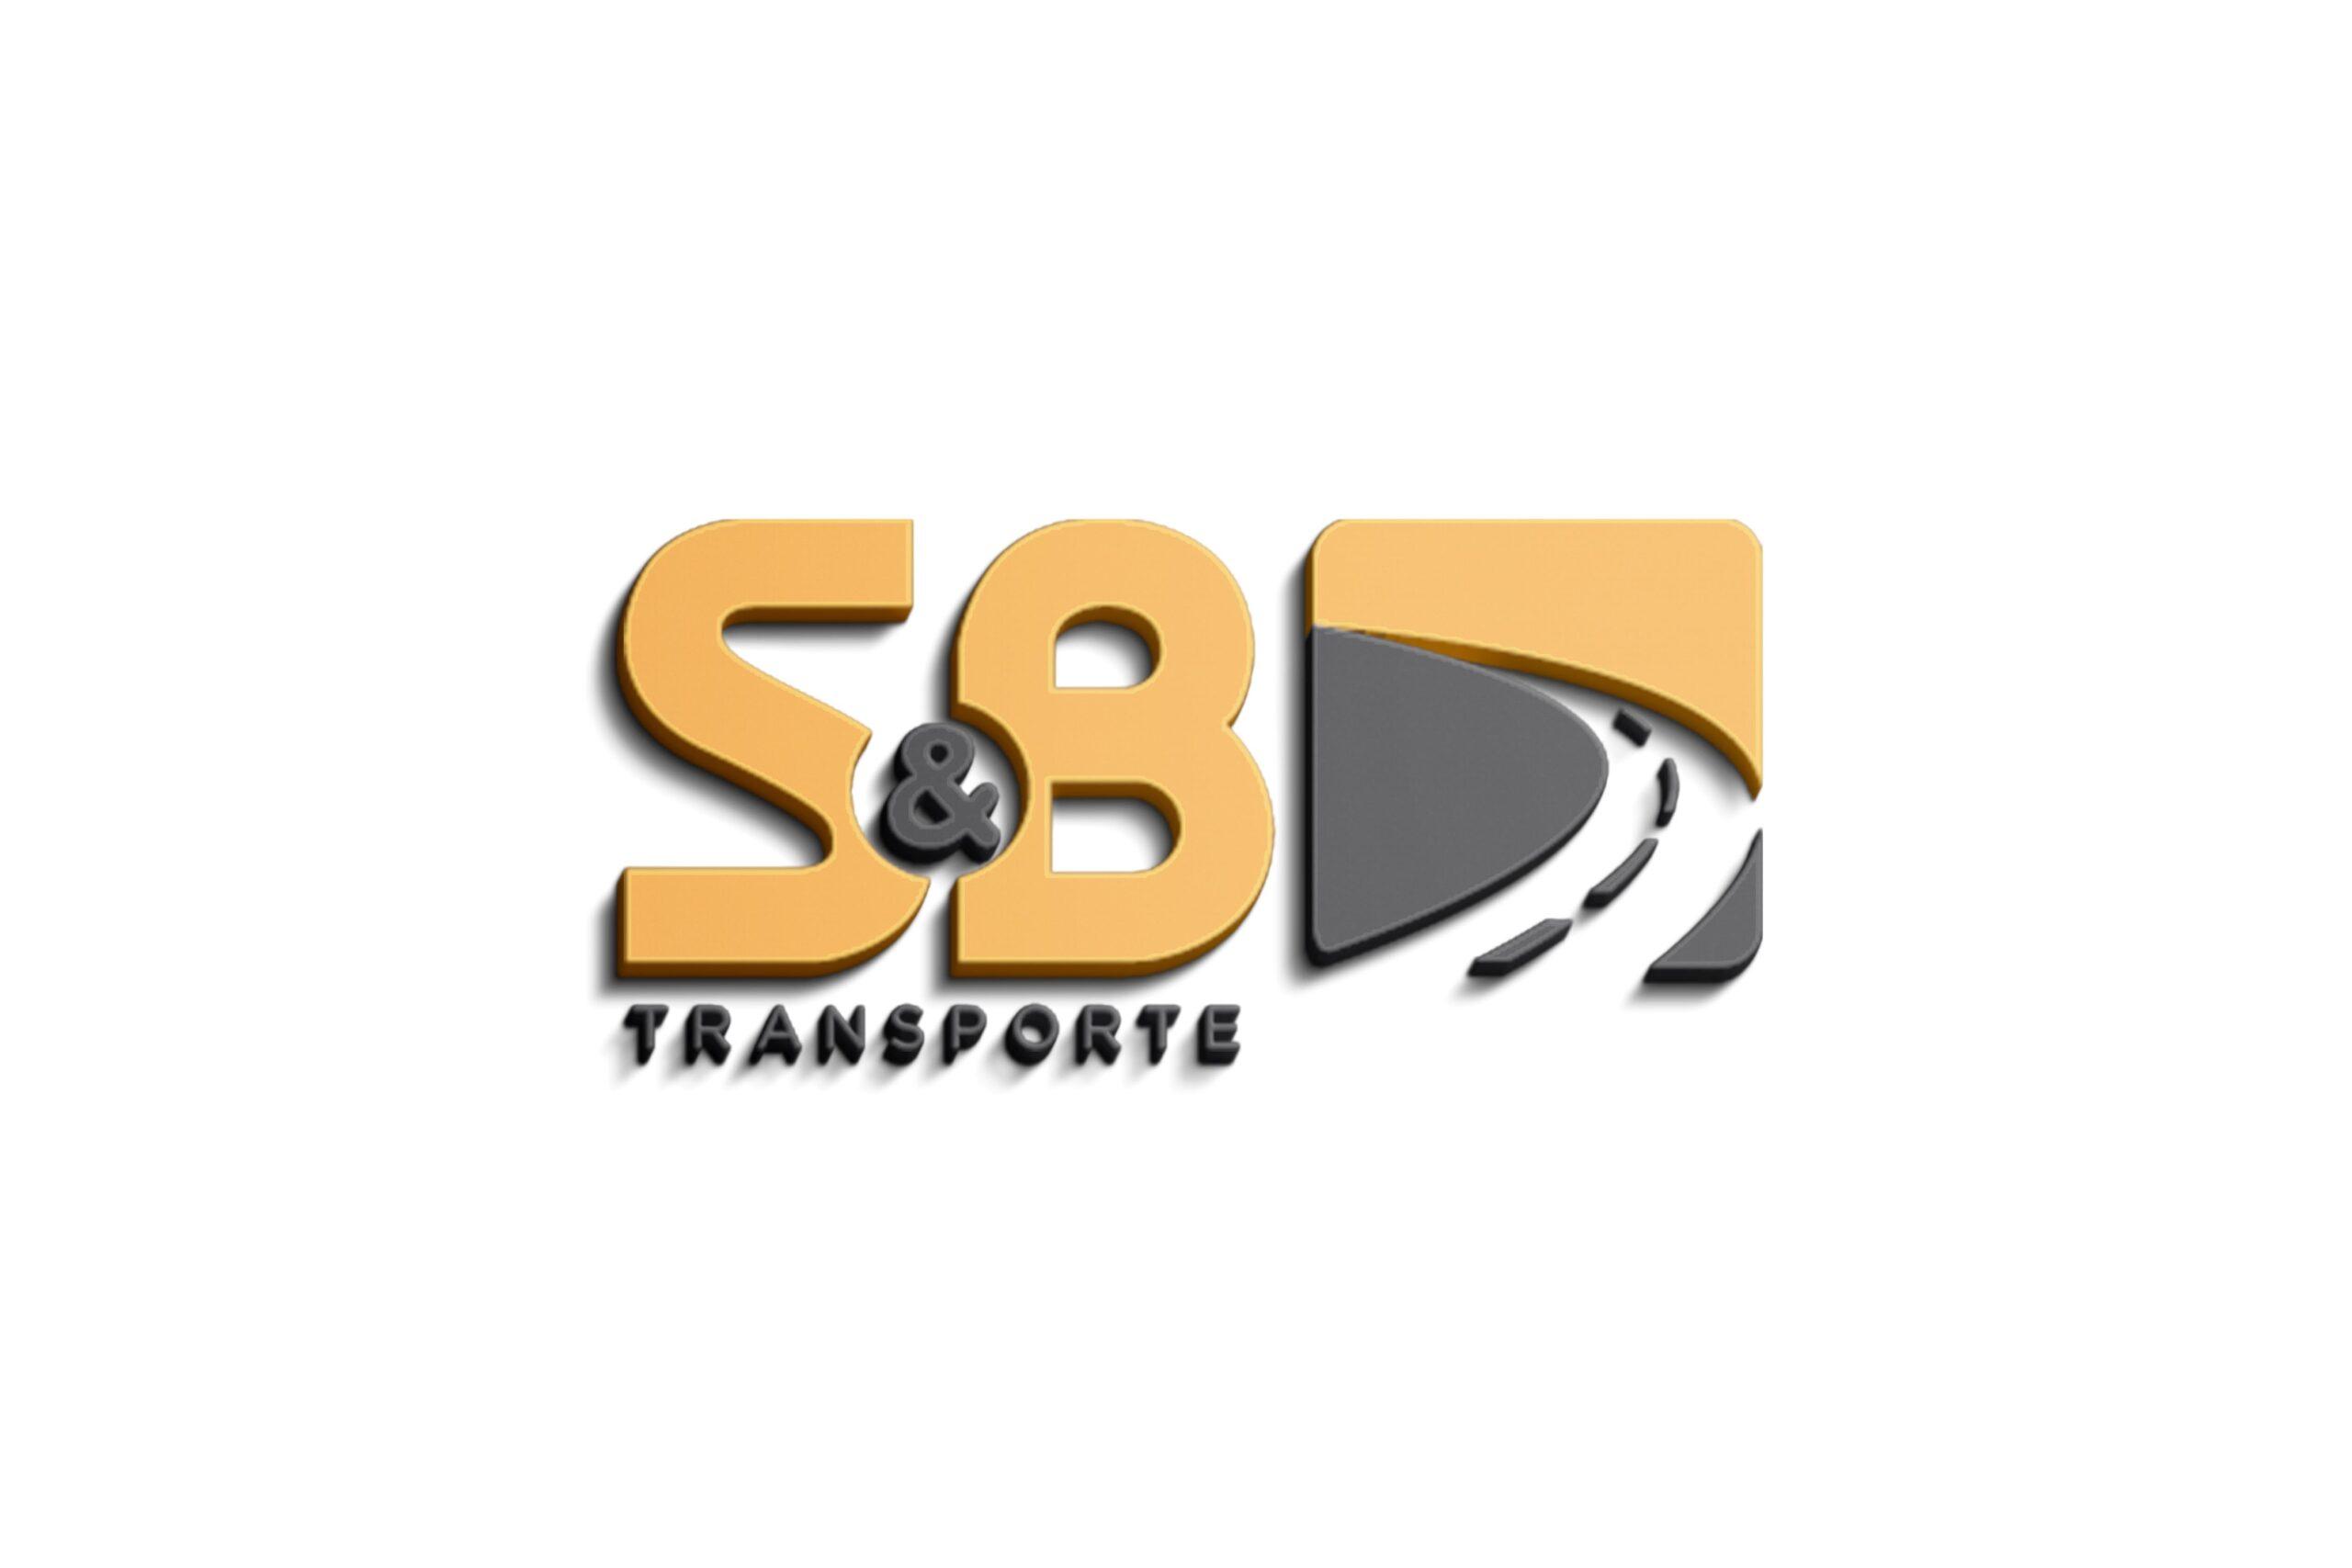 SB Transporte